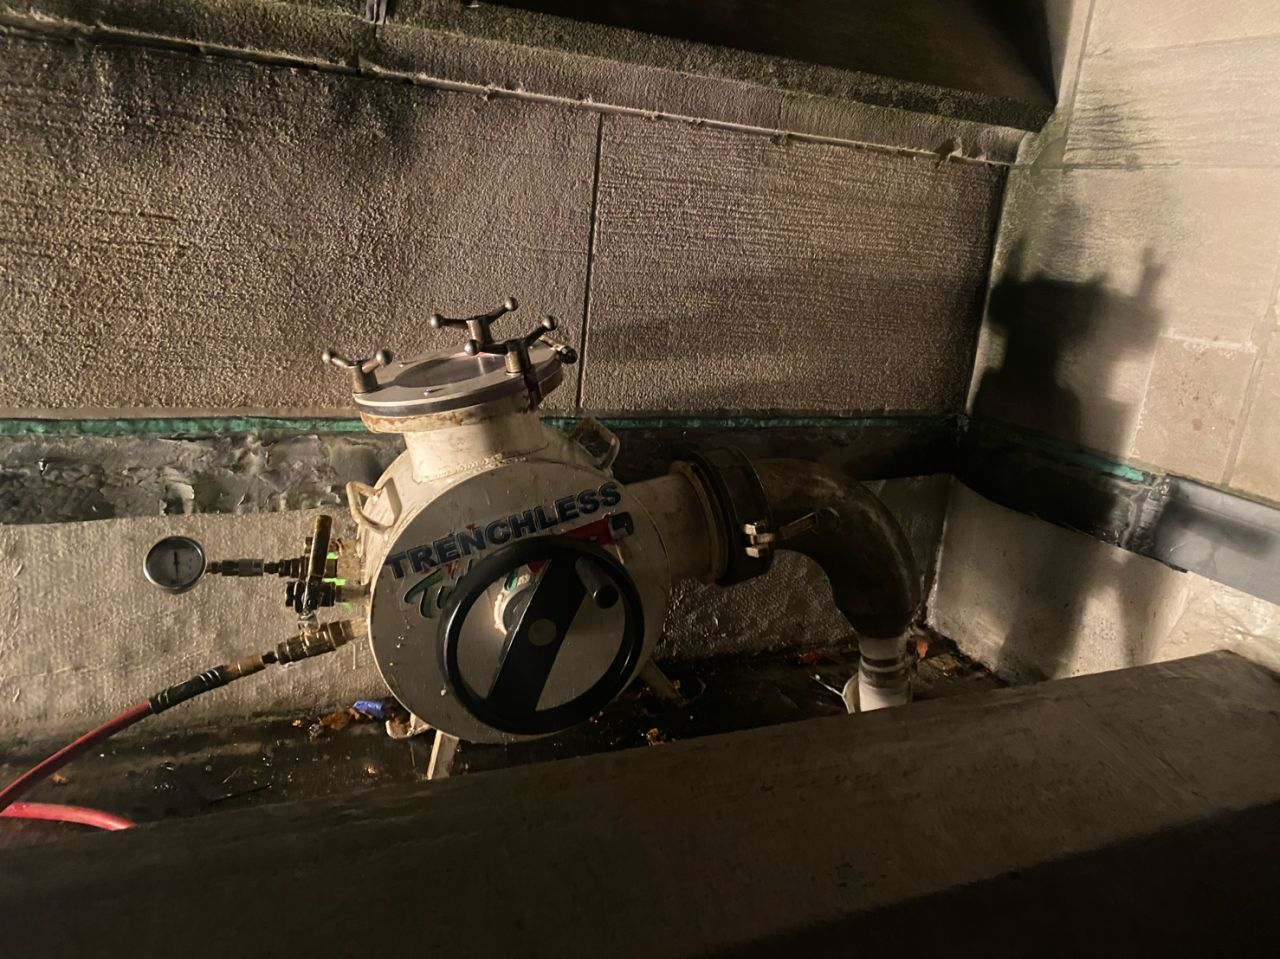 nyc-church-storm-drain-repair-05